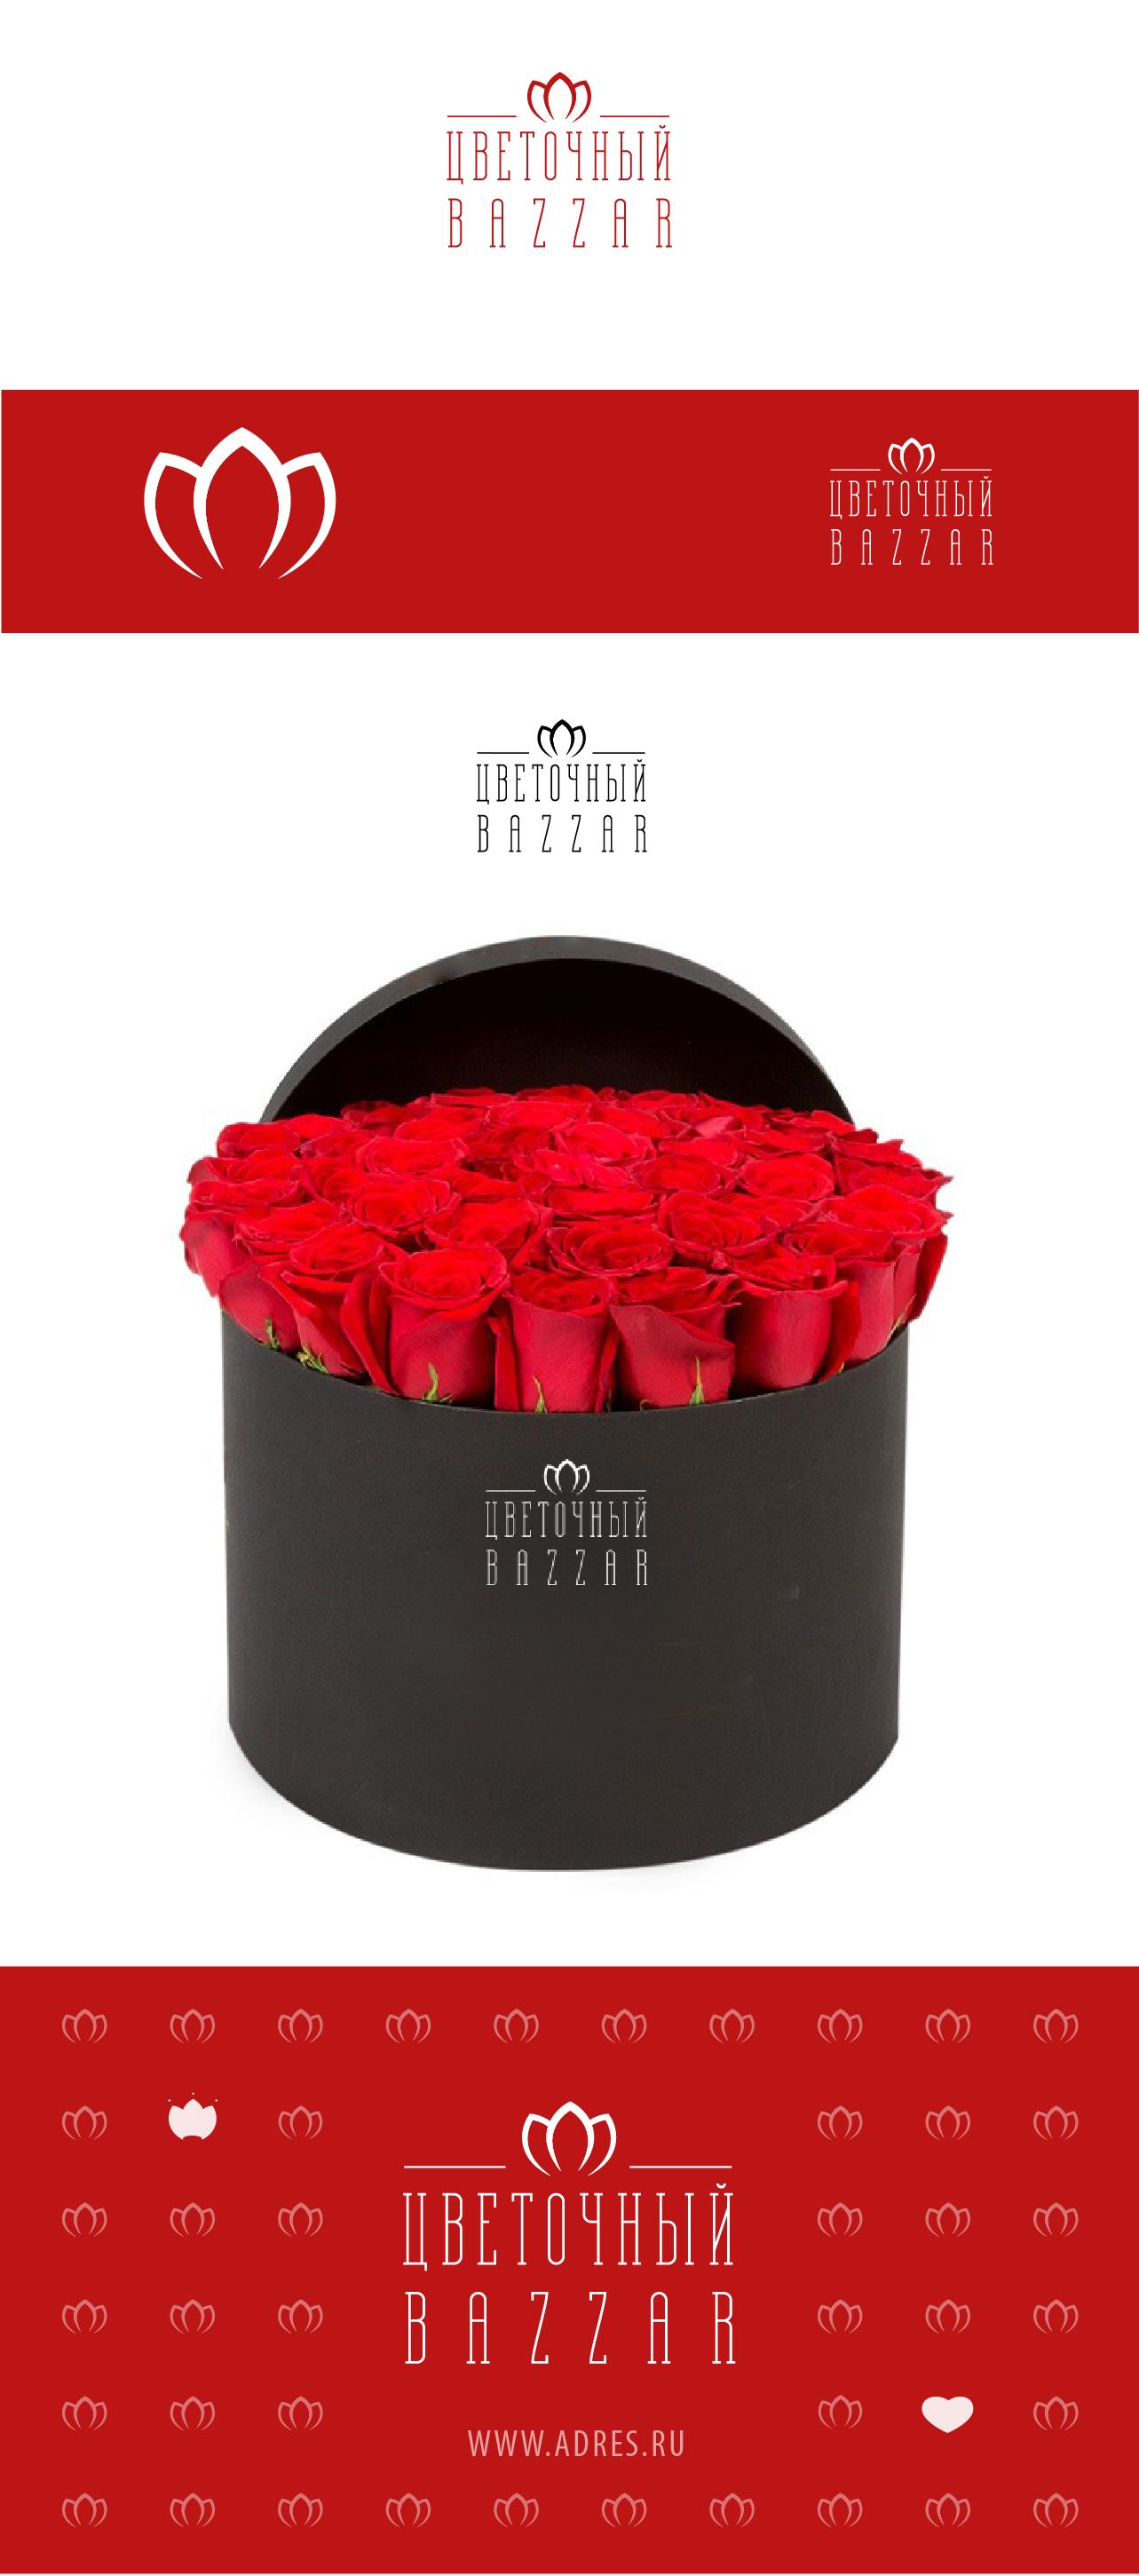 Разработка фирменного стиля для цветочного салона фото f_2345c3497a2a4340.jpg